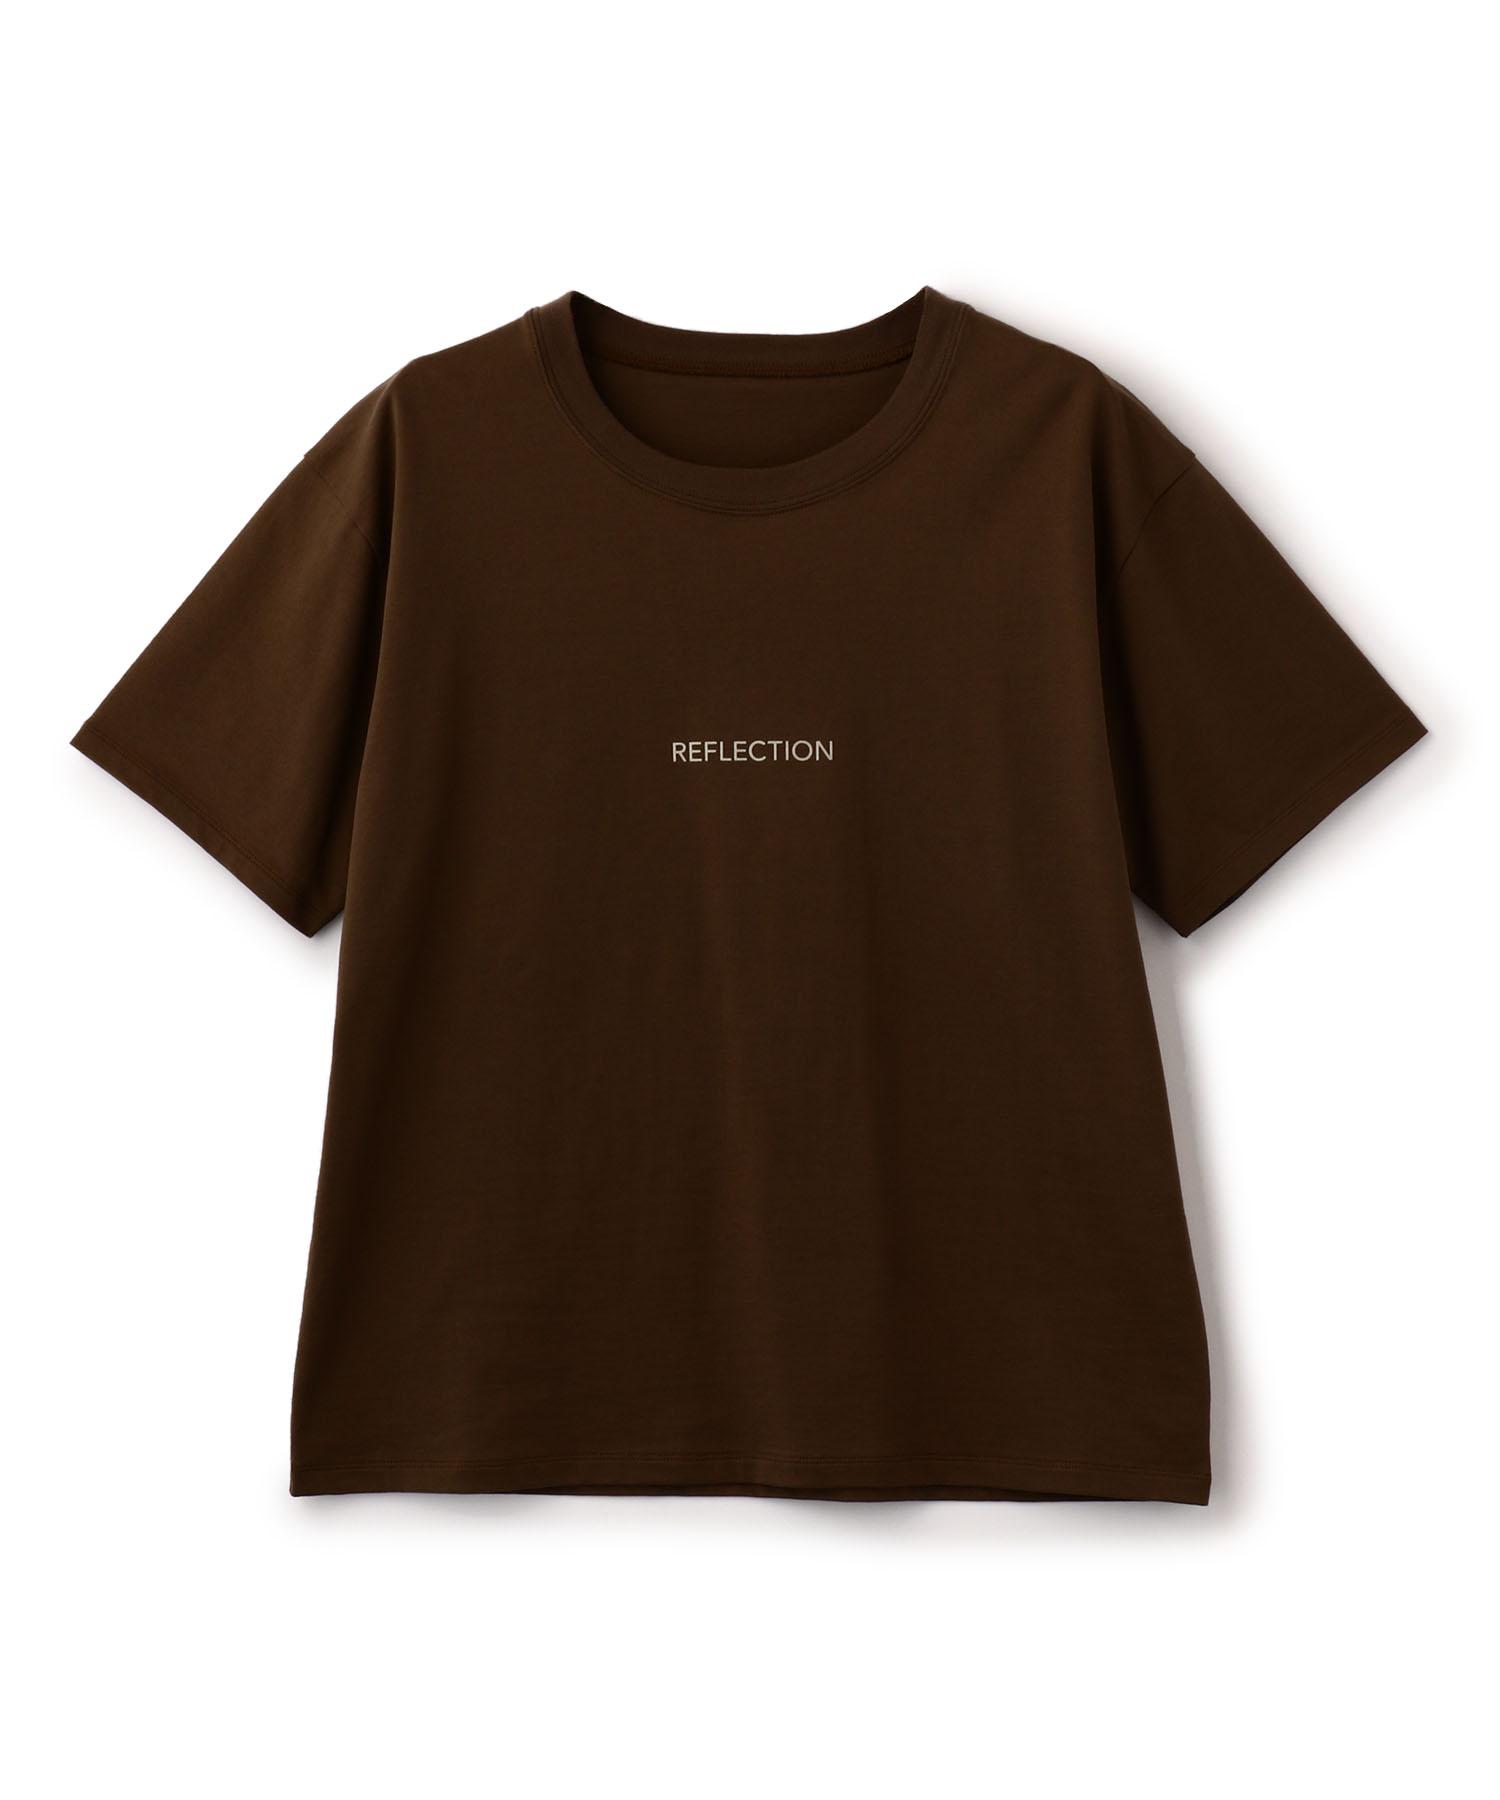 REFLECTION Tシャツ